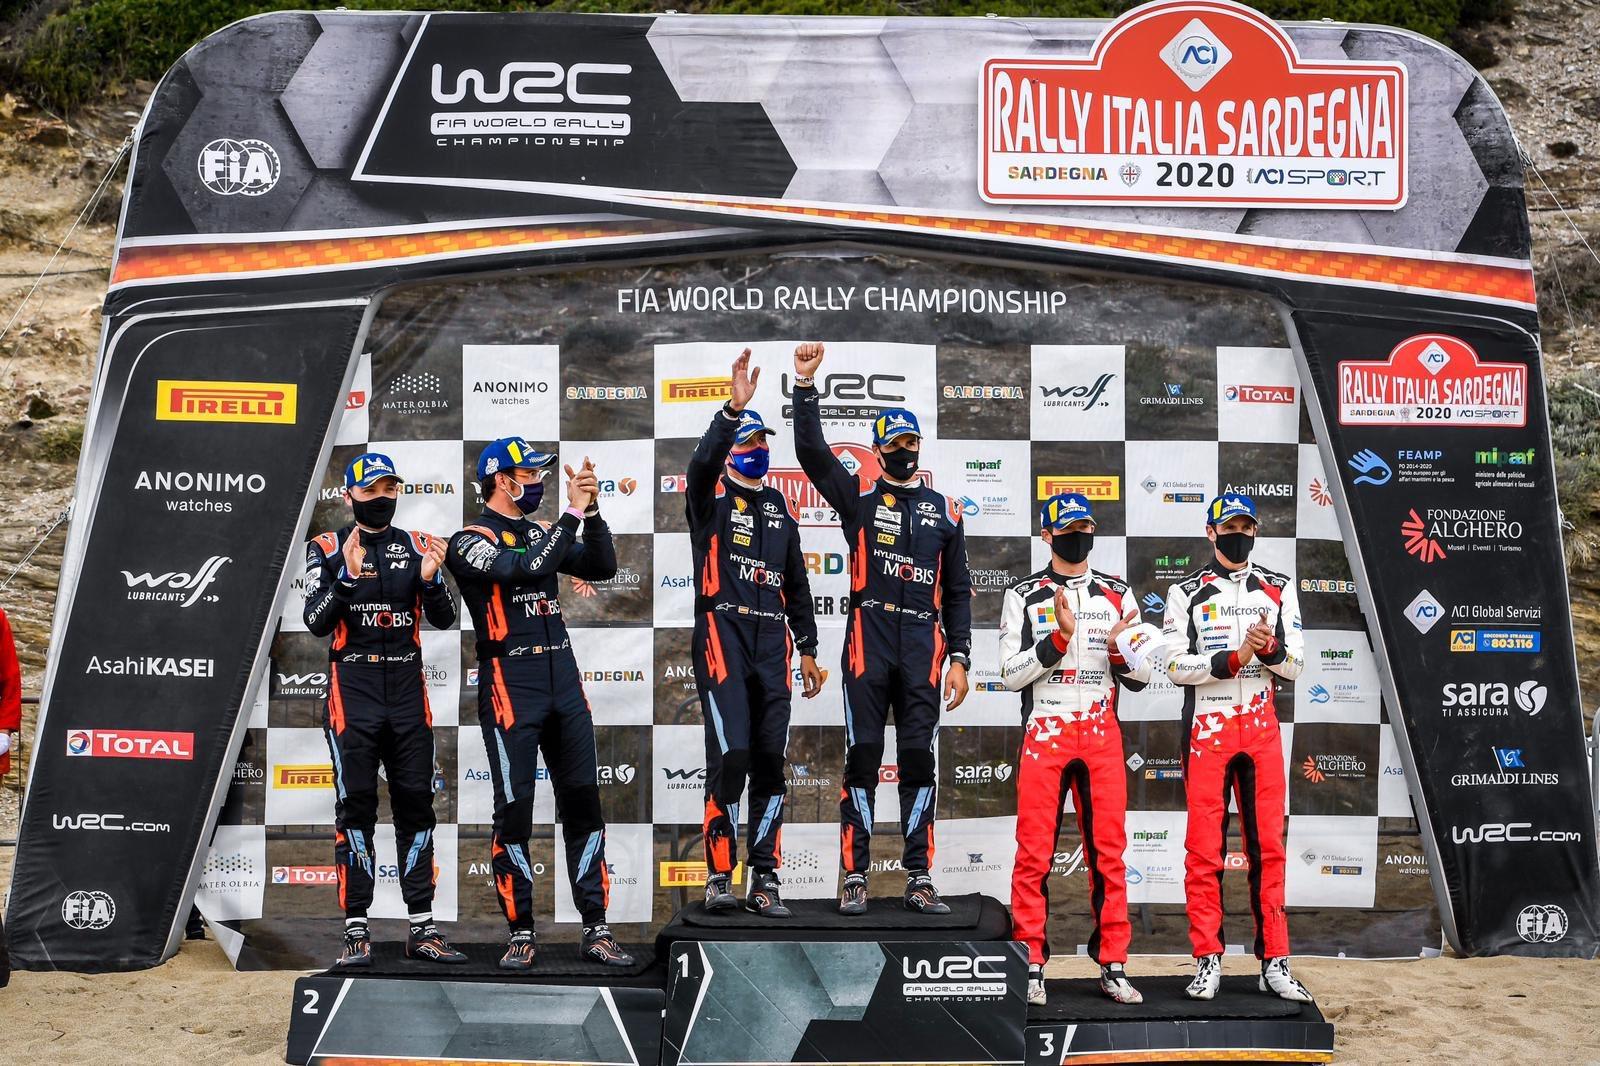 WRC: Rally d' Italia - Sardegna [8-10 Octubre] - Página 7 EkDAwivXgAEF4mQ?format=jpg&name=large